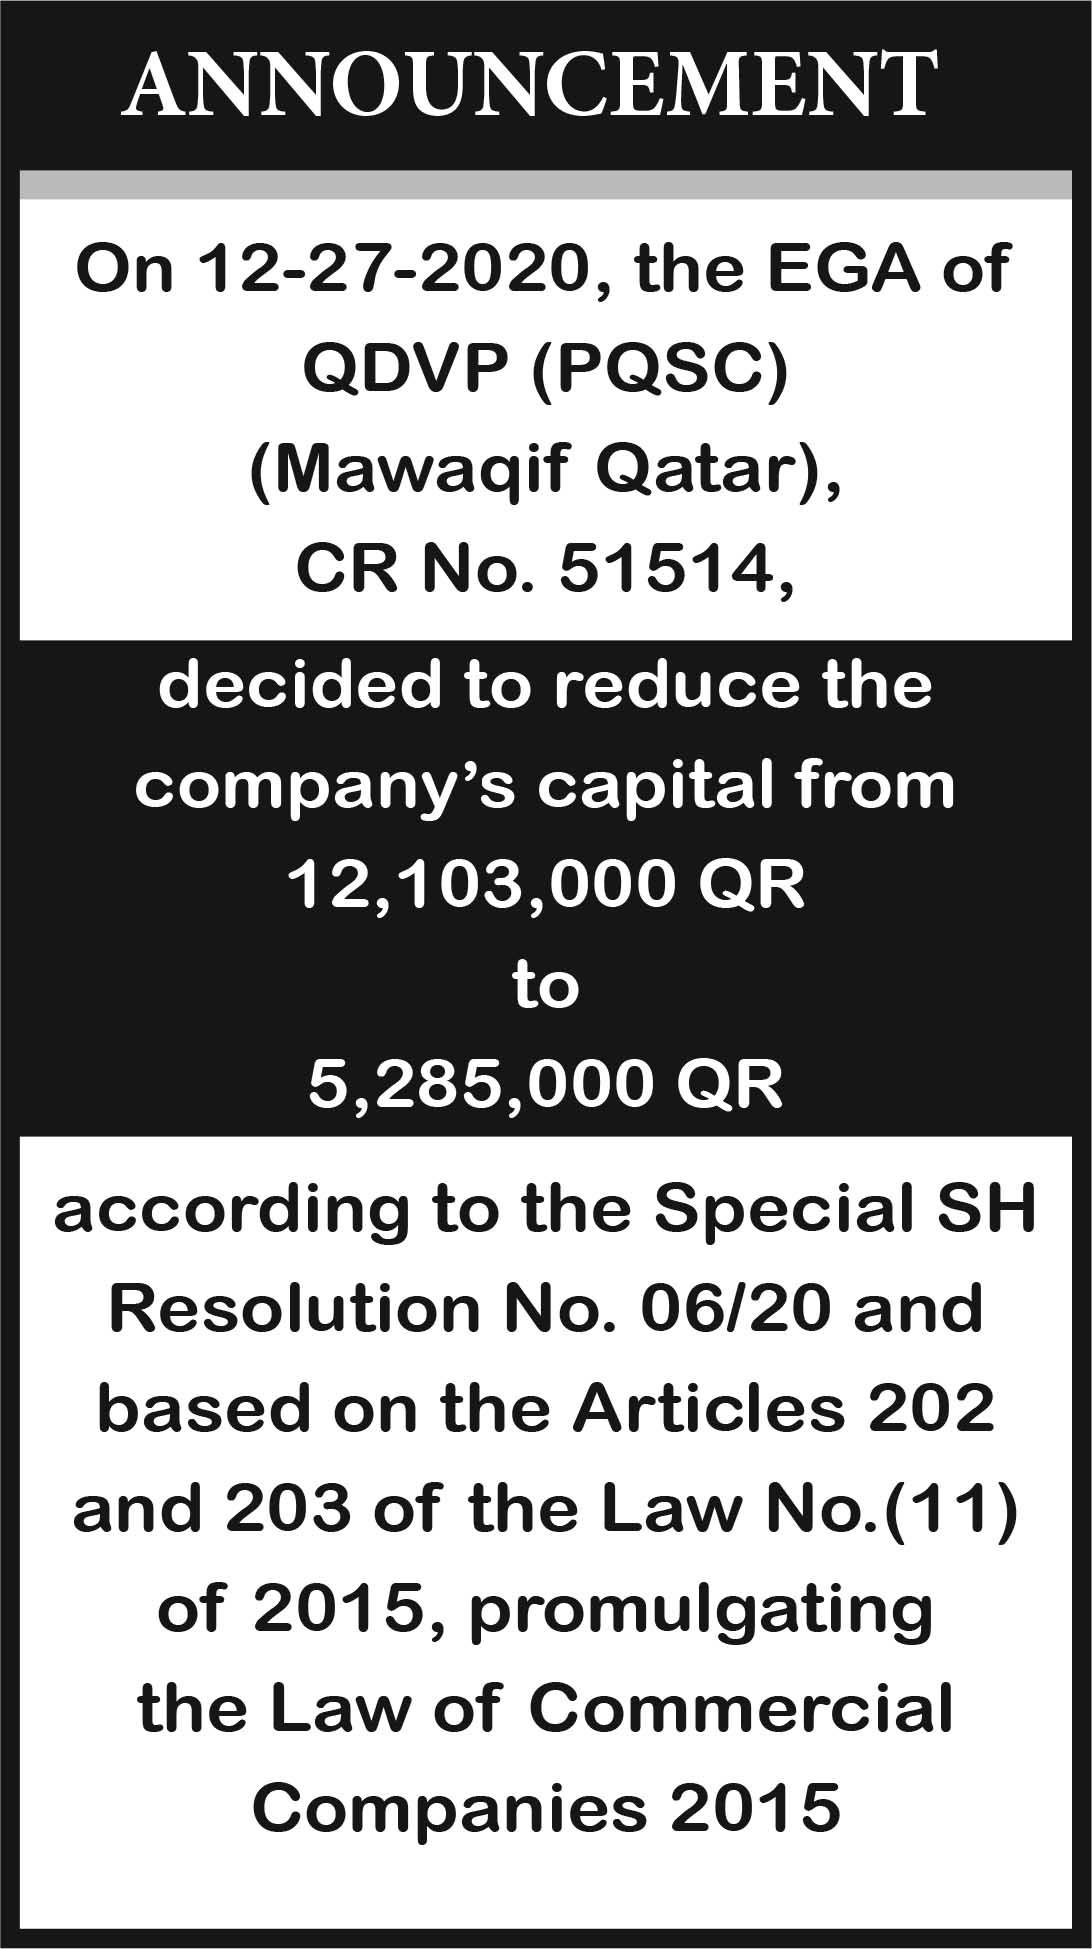 QDVP Capital Reduction